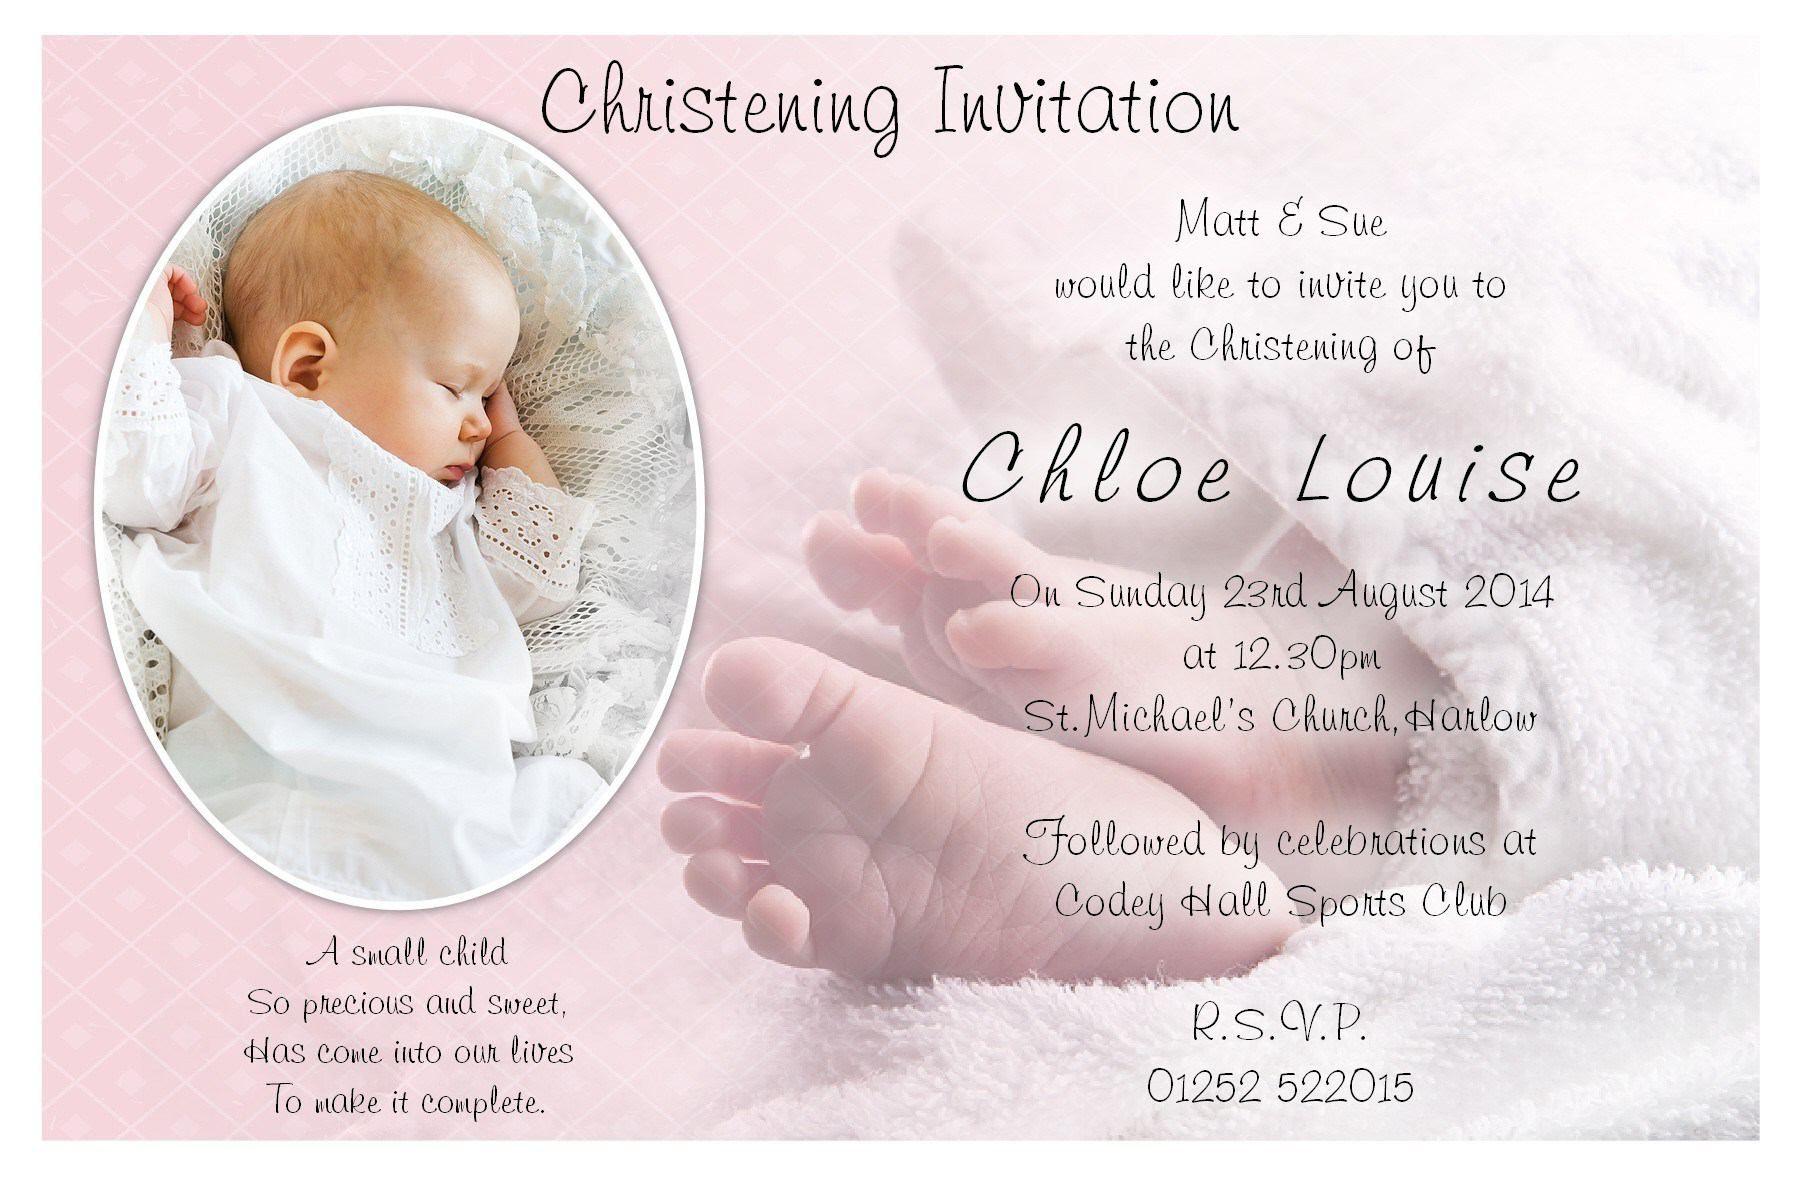 Christening Invitation Card Maker Christening Invitation Card Maker Software Baptism Invitations Girl Lds Baptism Invitations Christening Invitations Girl